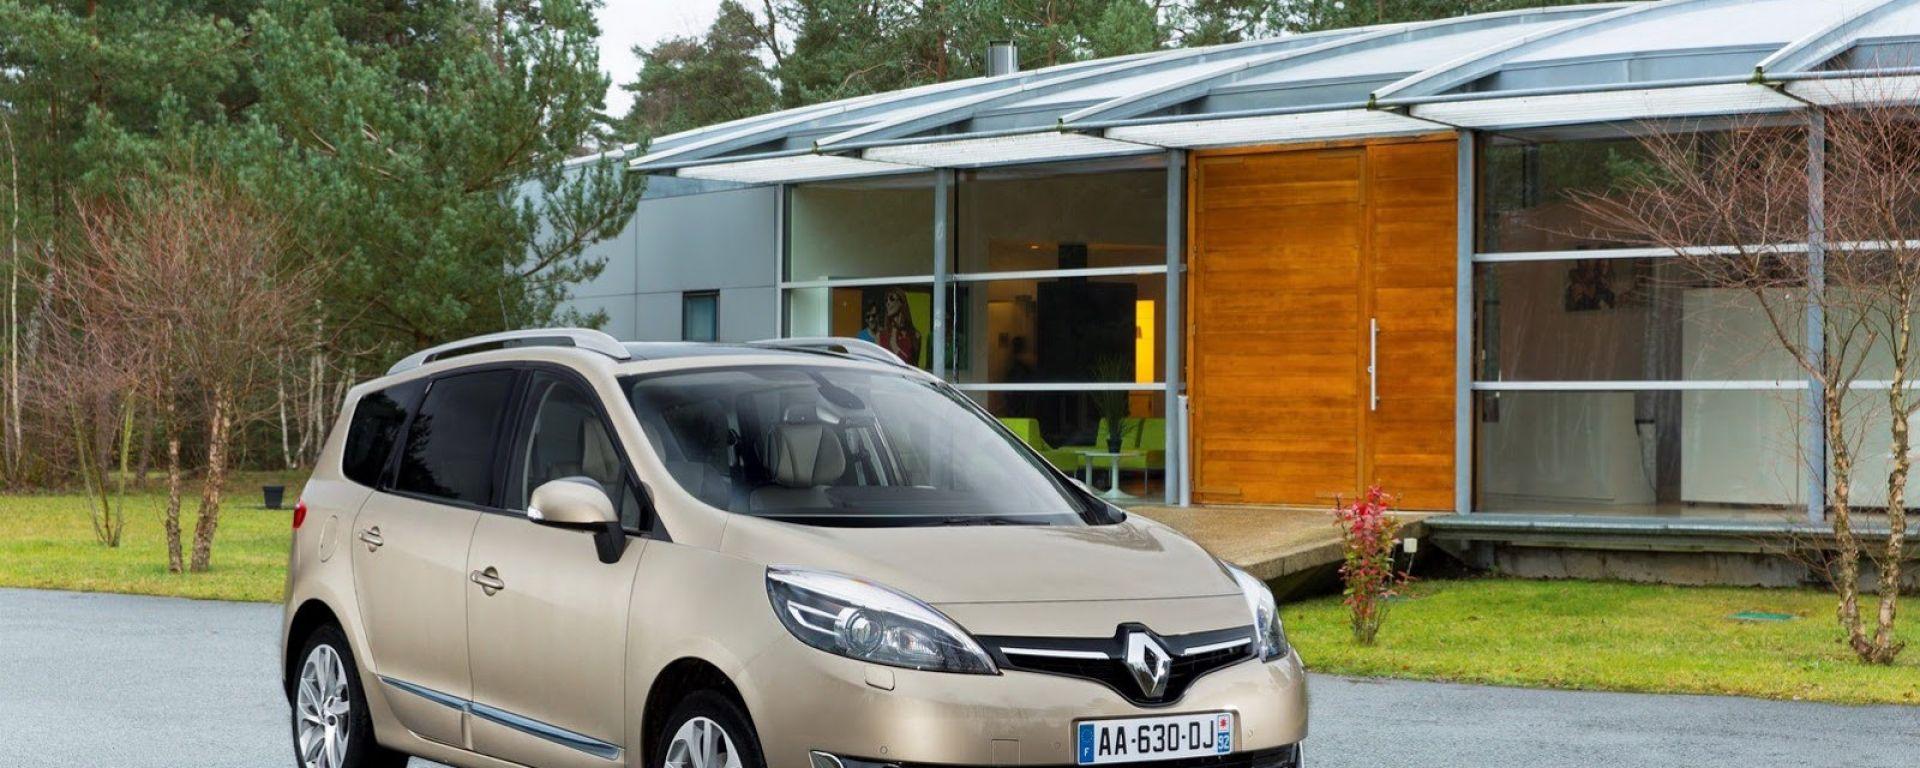 Renault Scénic e XMOD 2013